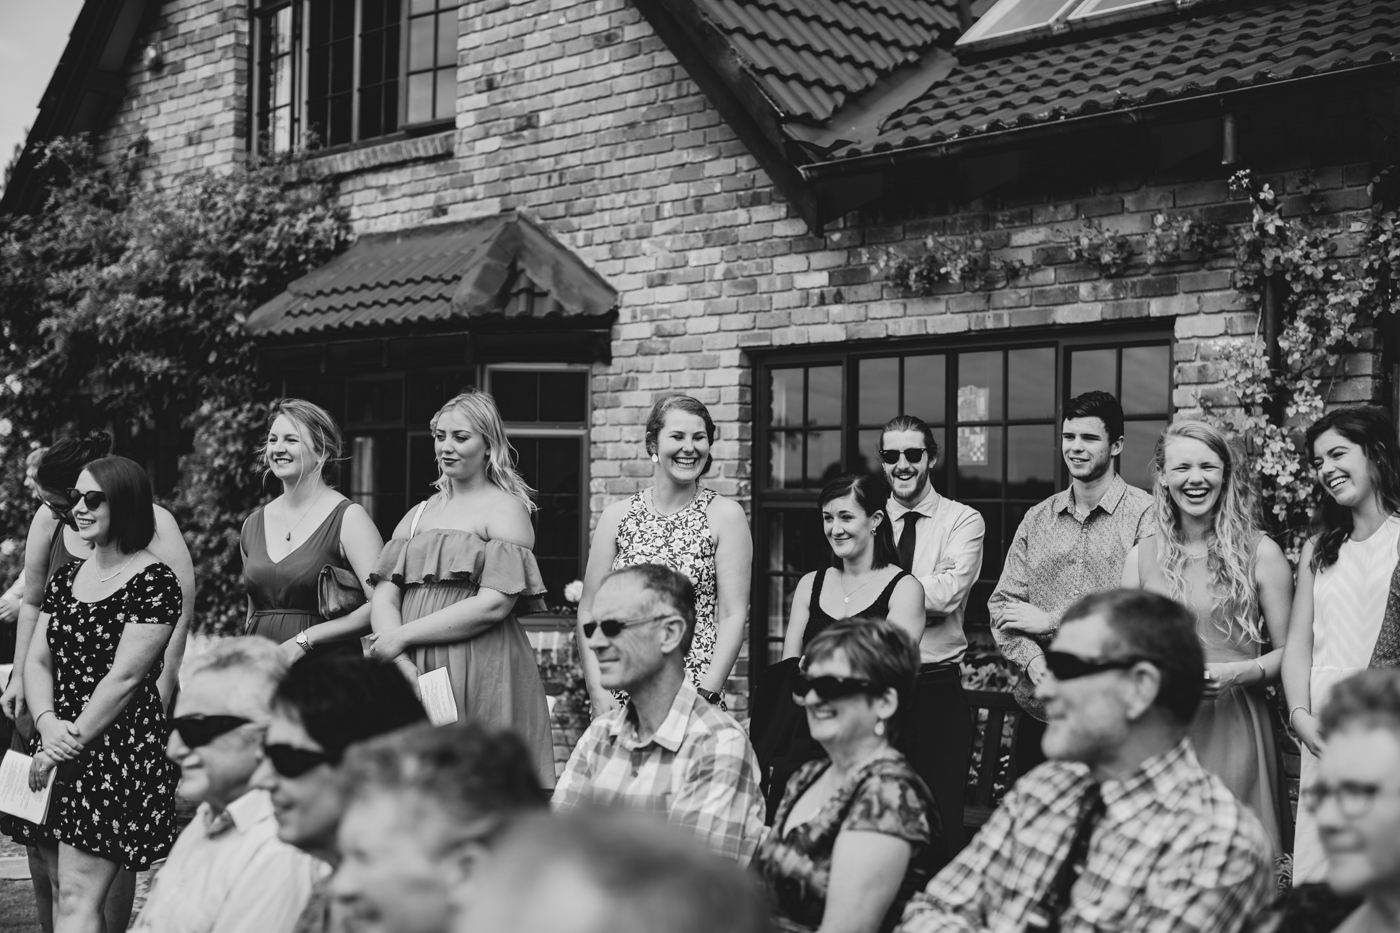 Ariana & Tim - Dunedin, New Zealand Wedding - Destination Wedding - Samantha Heather Photography-77.jpg